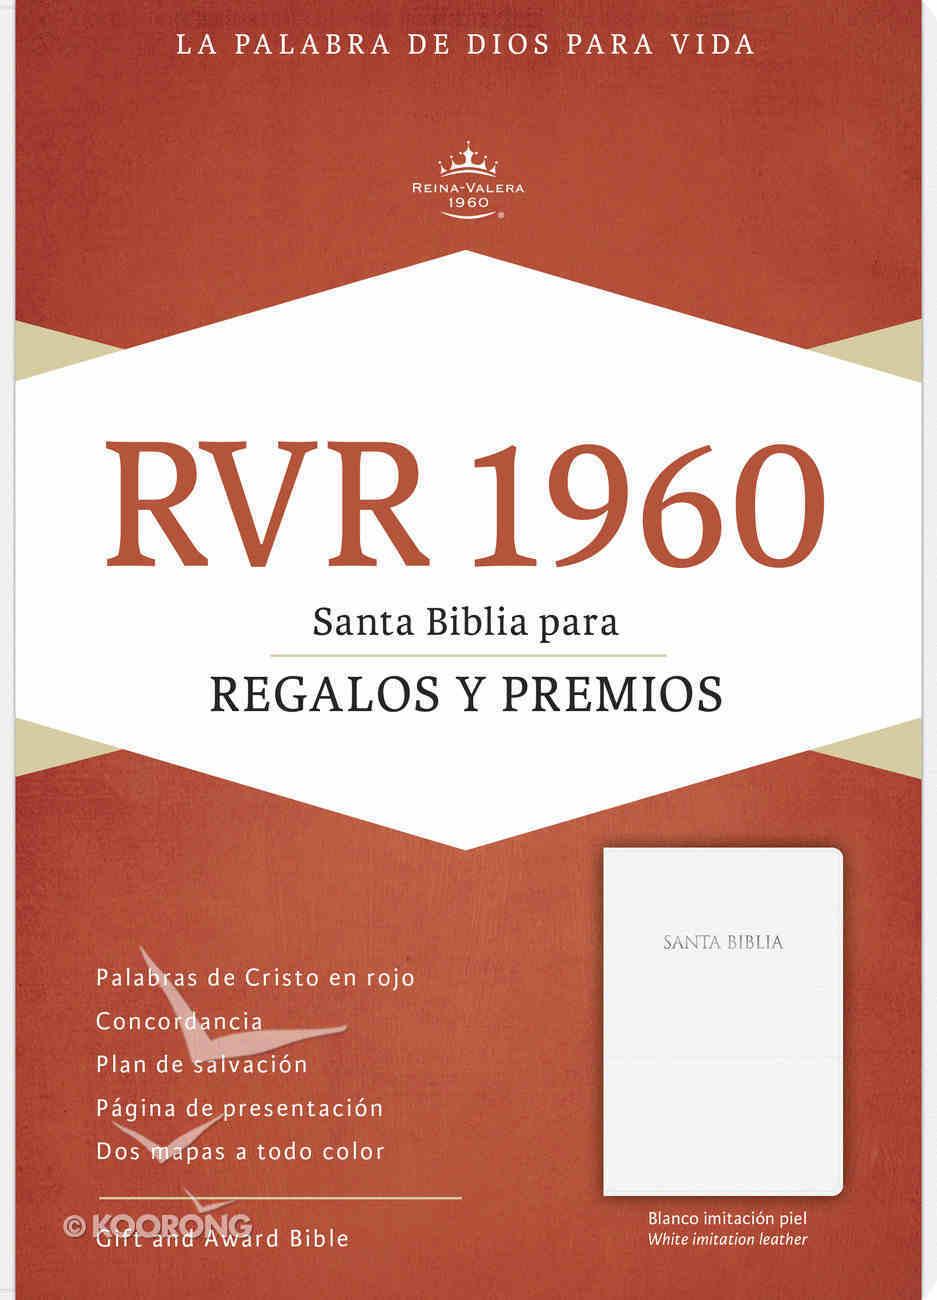 Rvr 1960 Biblia Para Regalos Y Premios Blanco (Red Letter Edition) (White) Imitation Leather